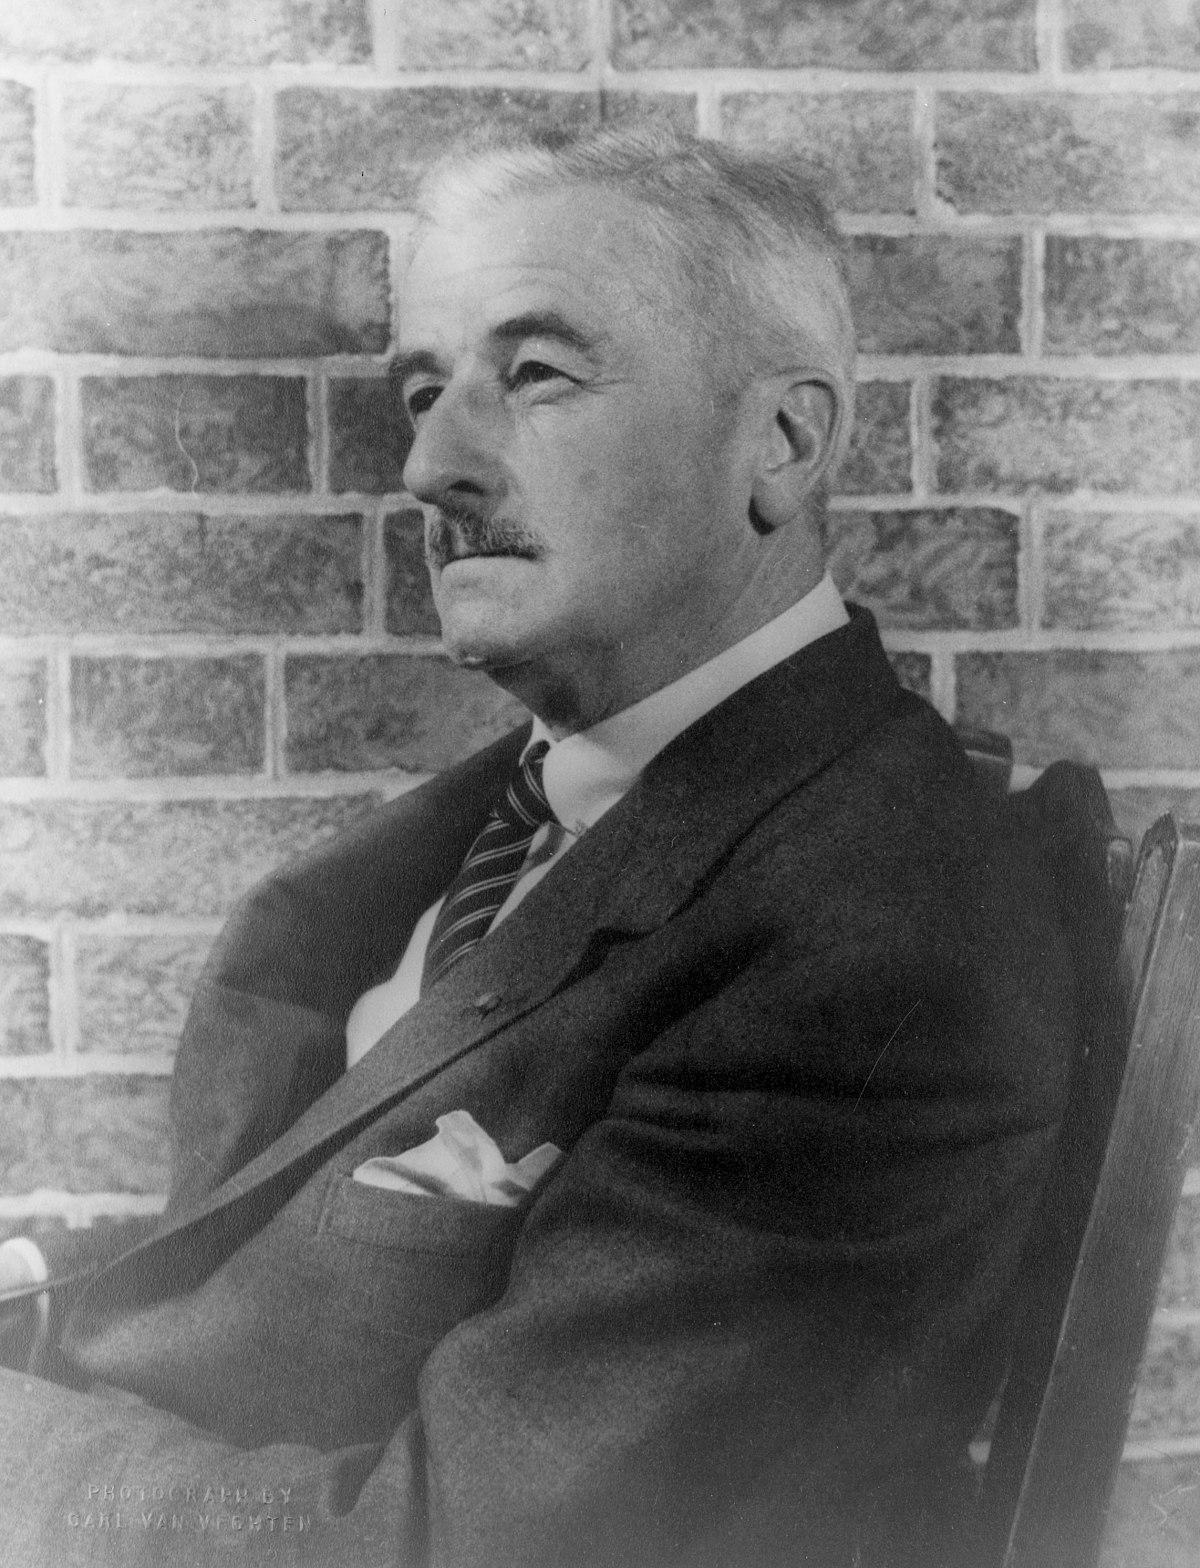 Faulkner essays